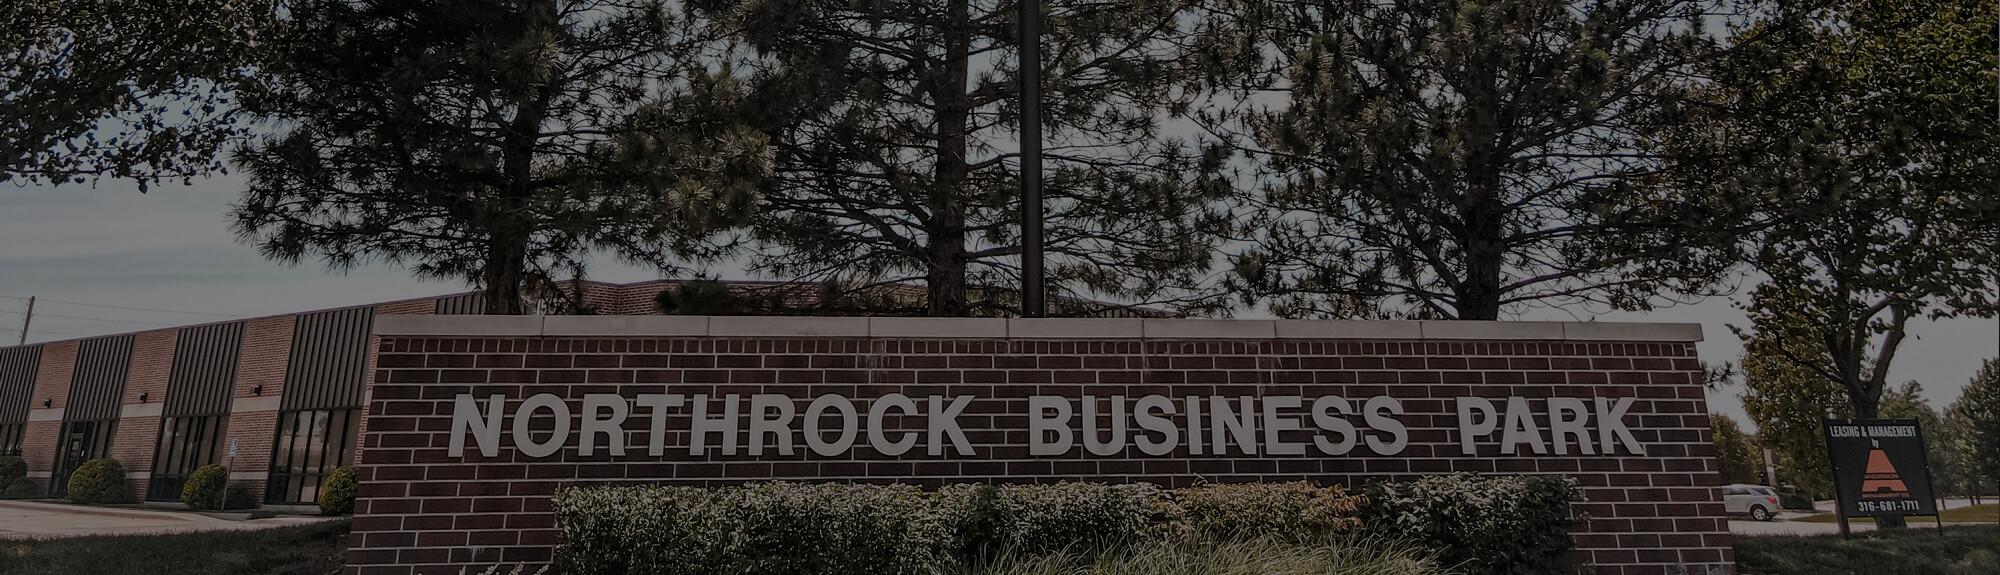 Northrock Business Park